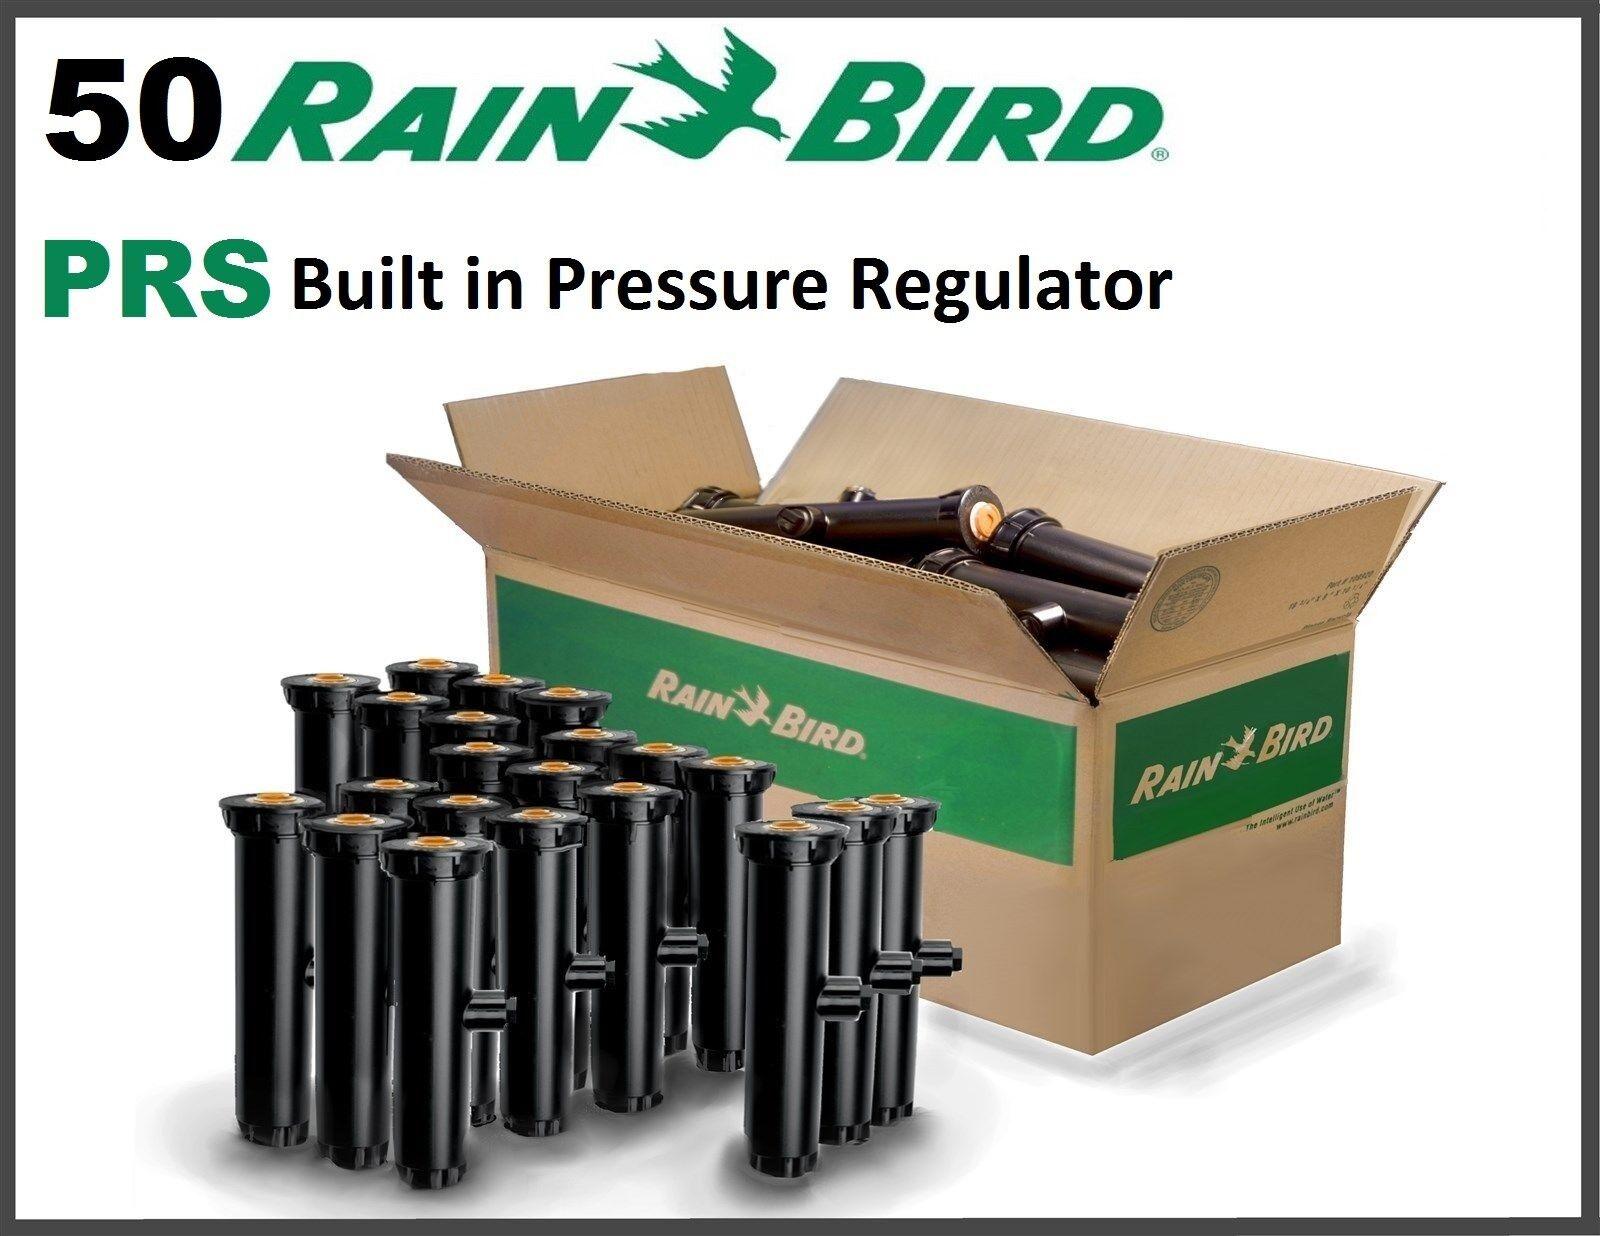 50 Rainbird 1806-PRS 6  Spray Spray Spray Body Sprinkler Pop Up Pressure Regulator Built In 4ec990